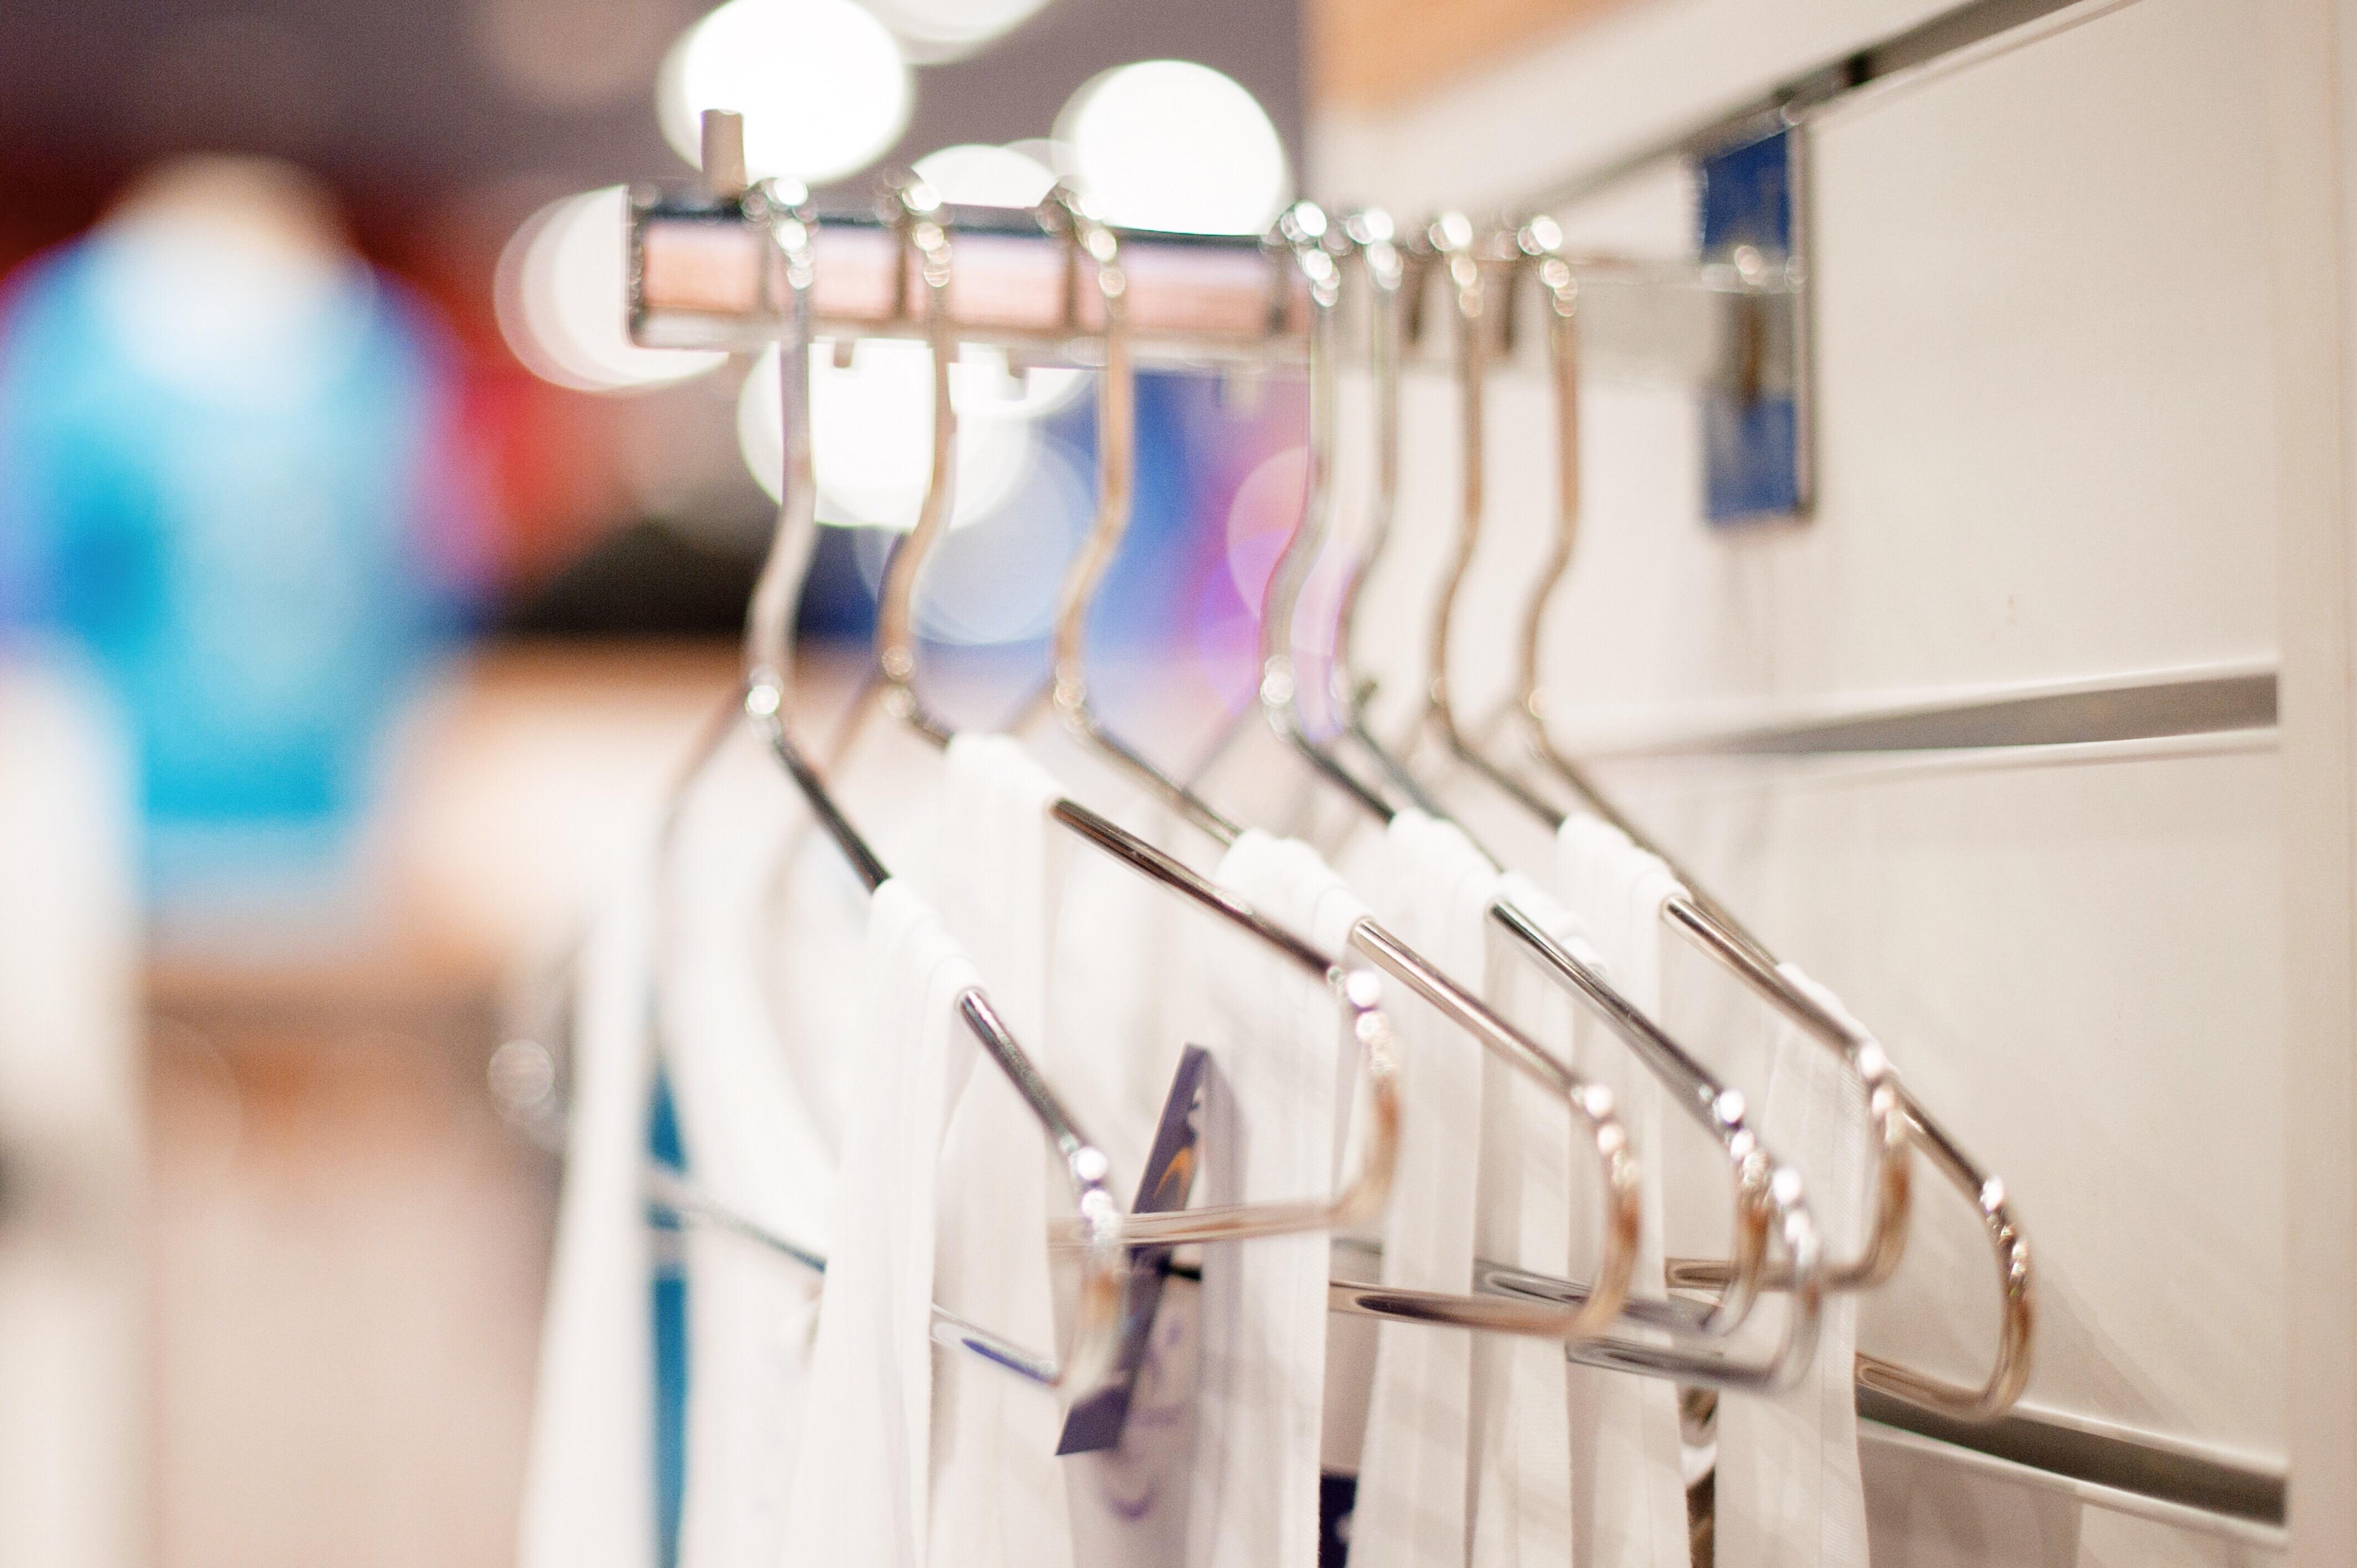 clothes-hanger-retail-store-discounts-clearance-sa-BD4PL3L